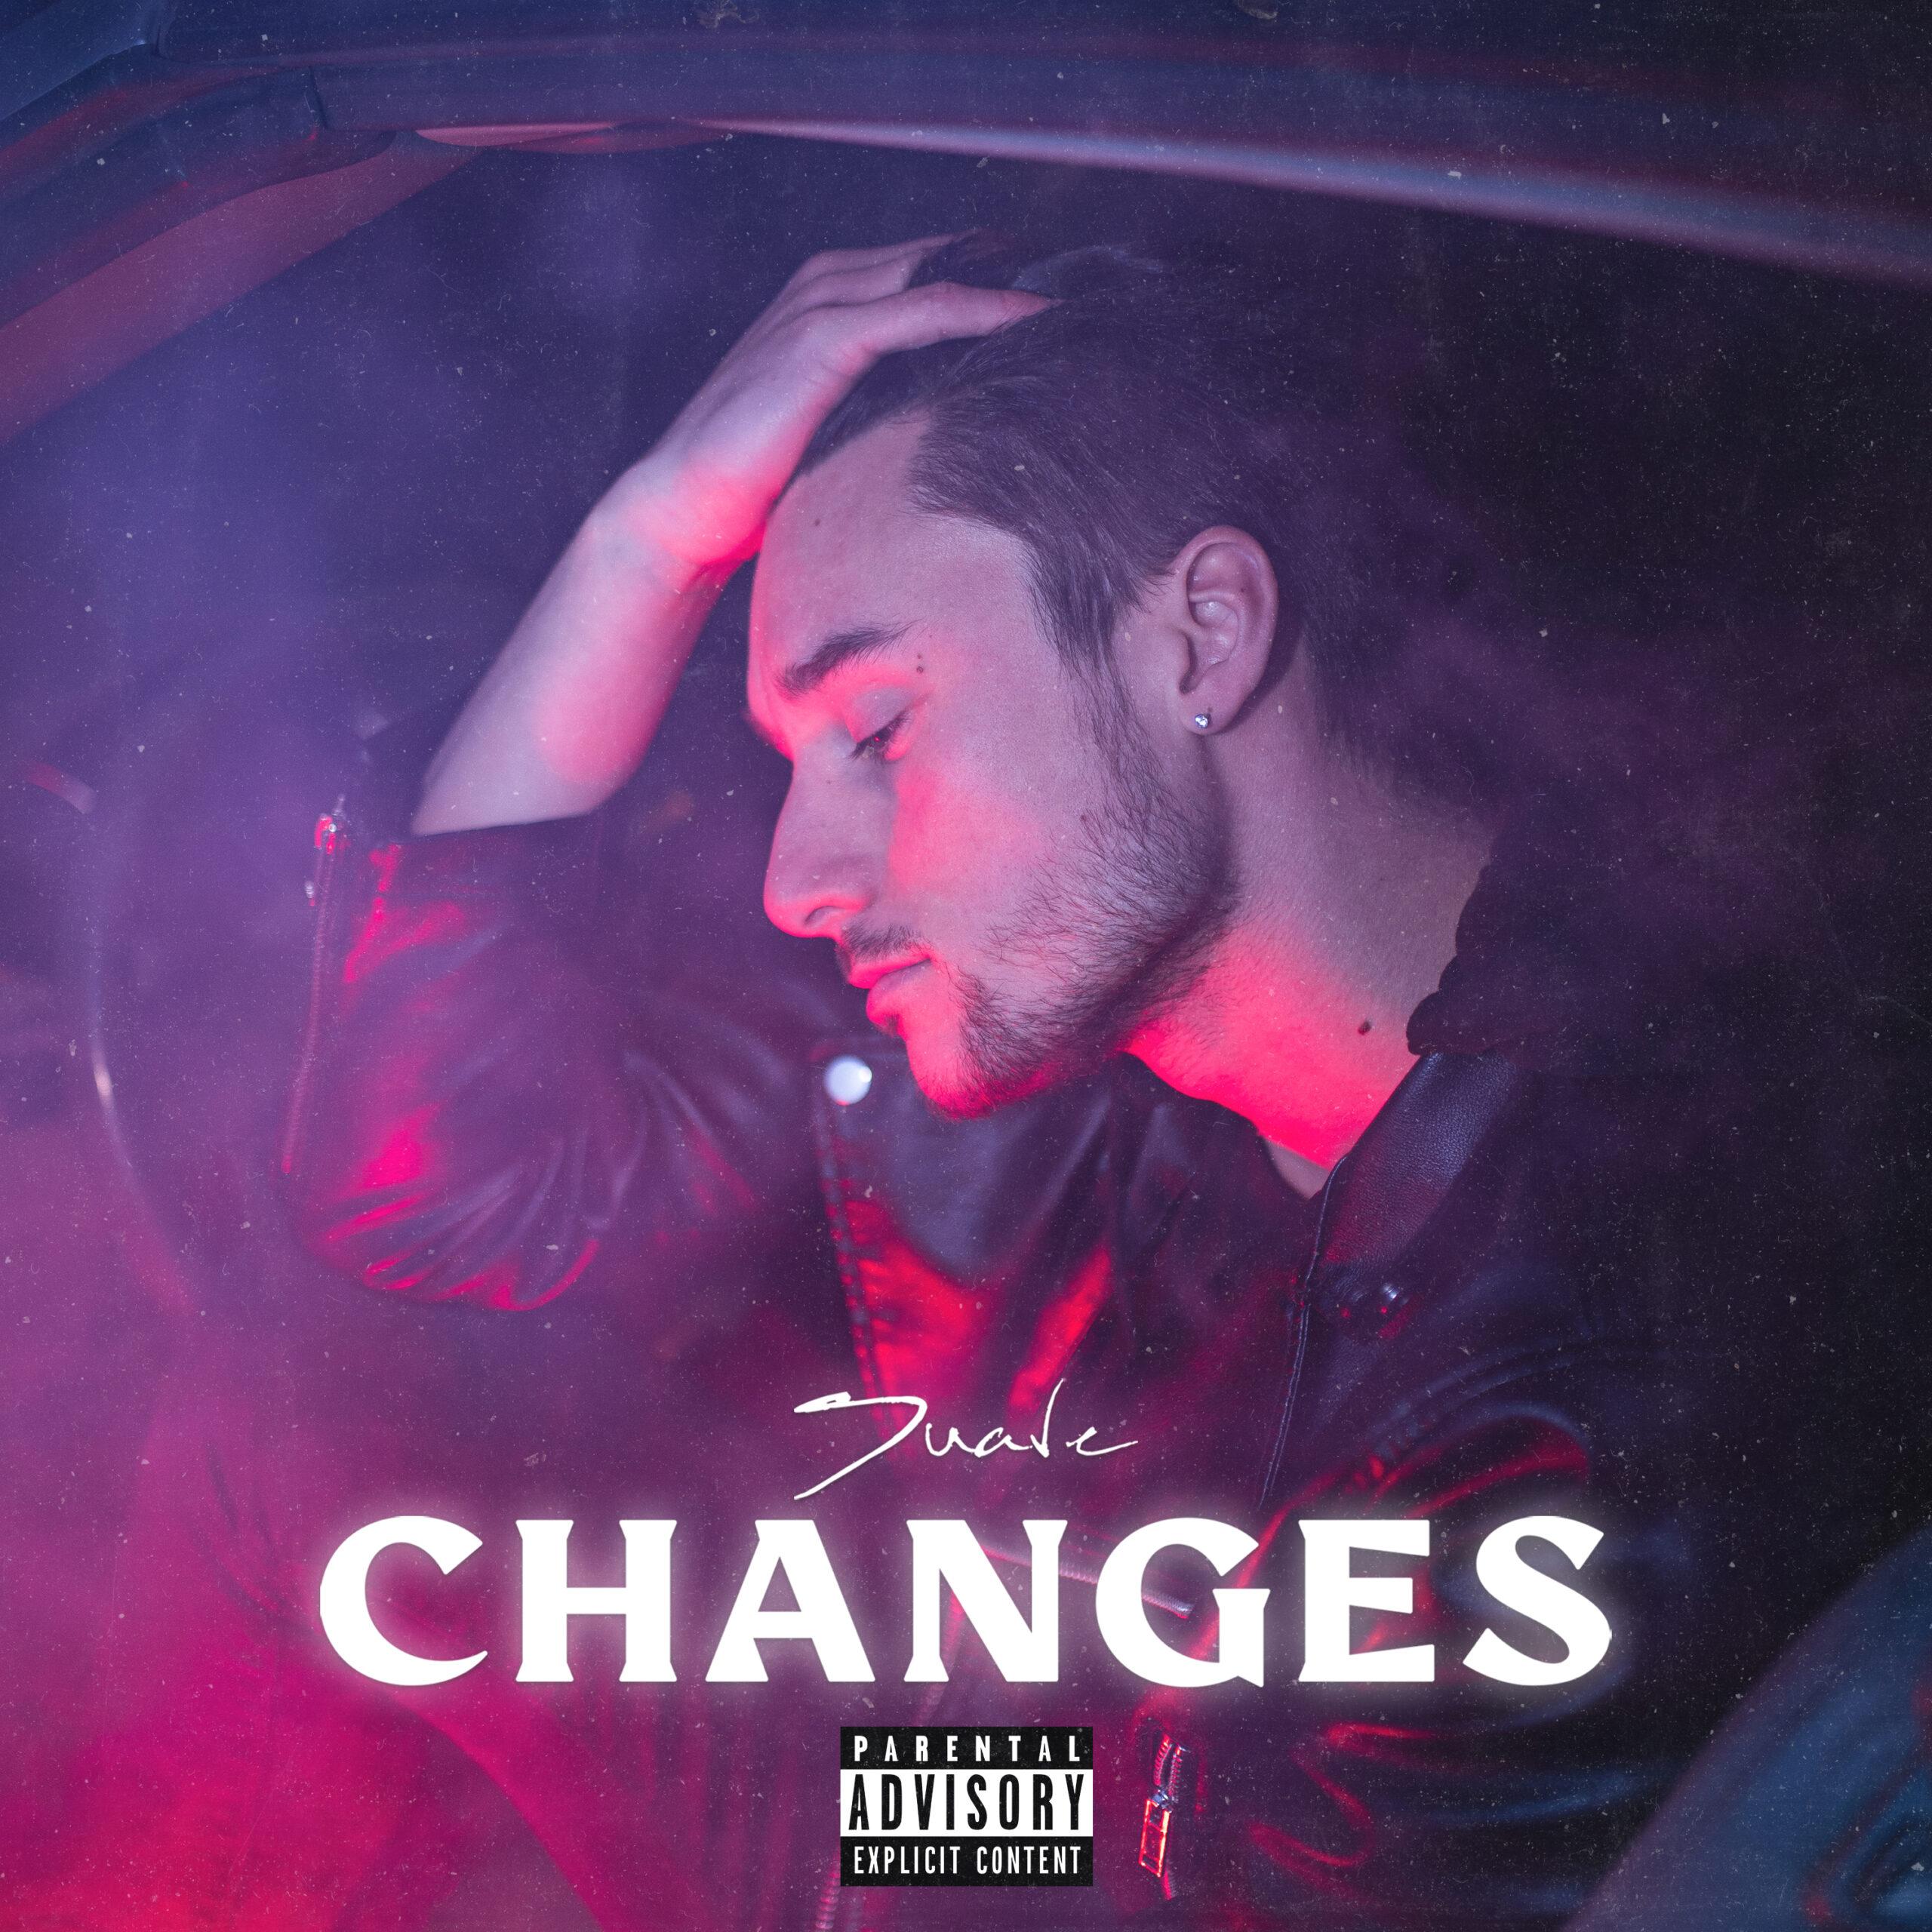 Suave - Changes